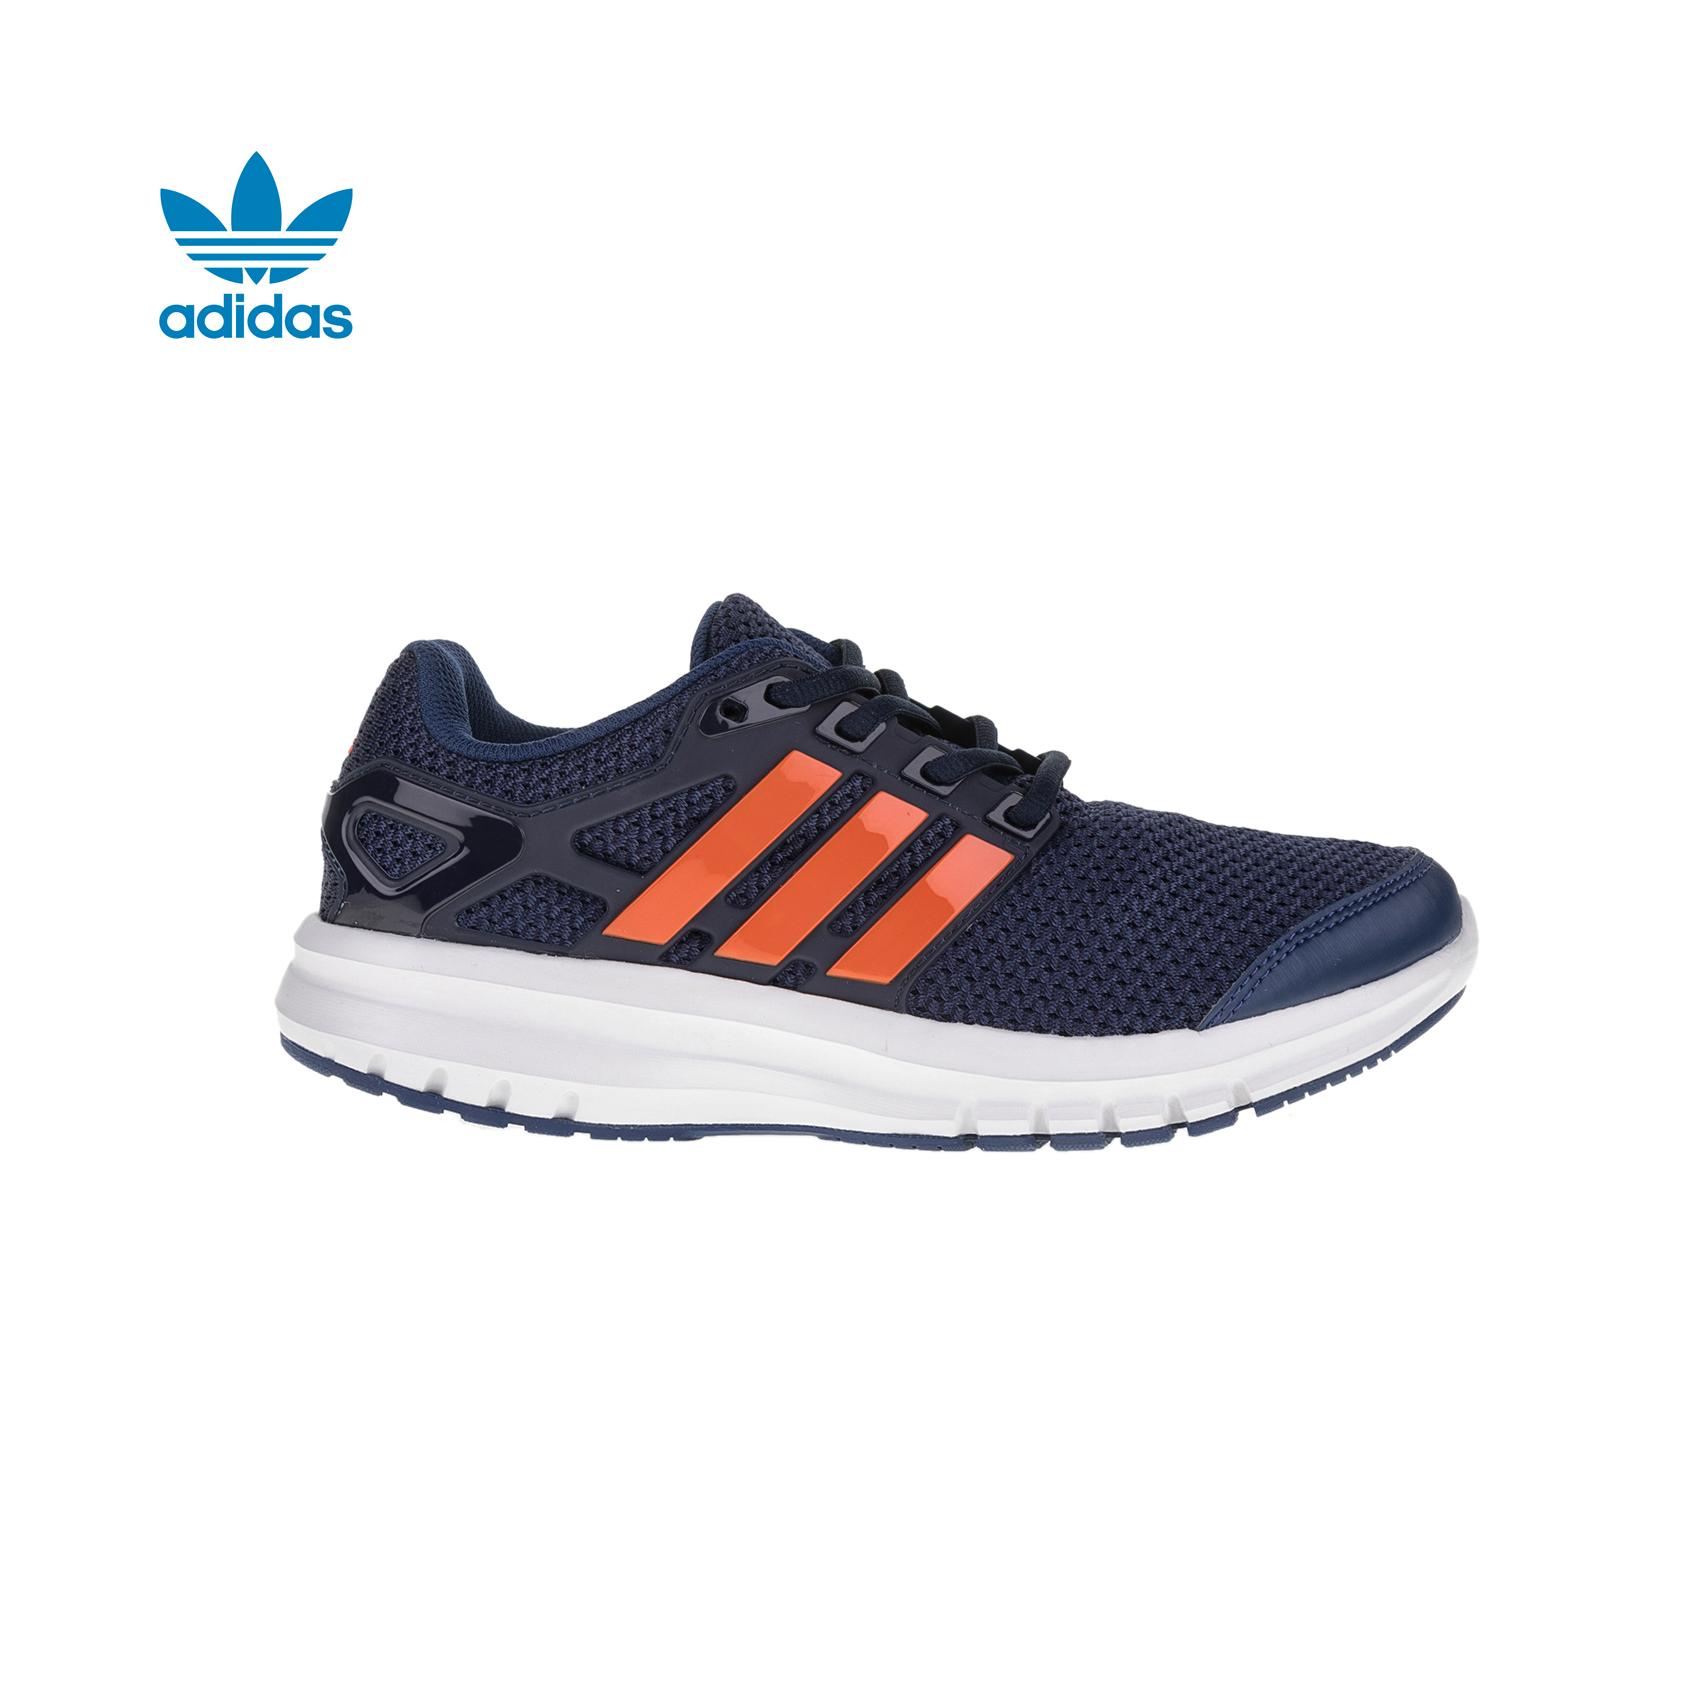 adidas Originals – Παιδικά παπούτσια adidas energy cloud k μπλε